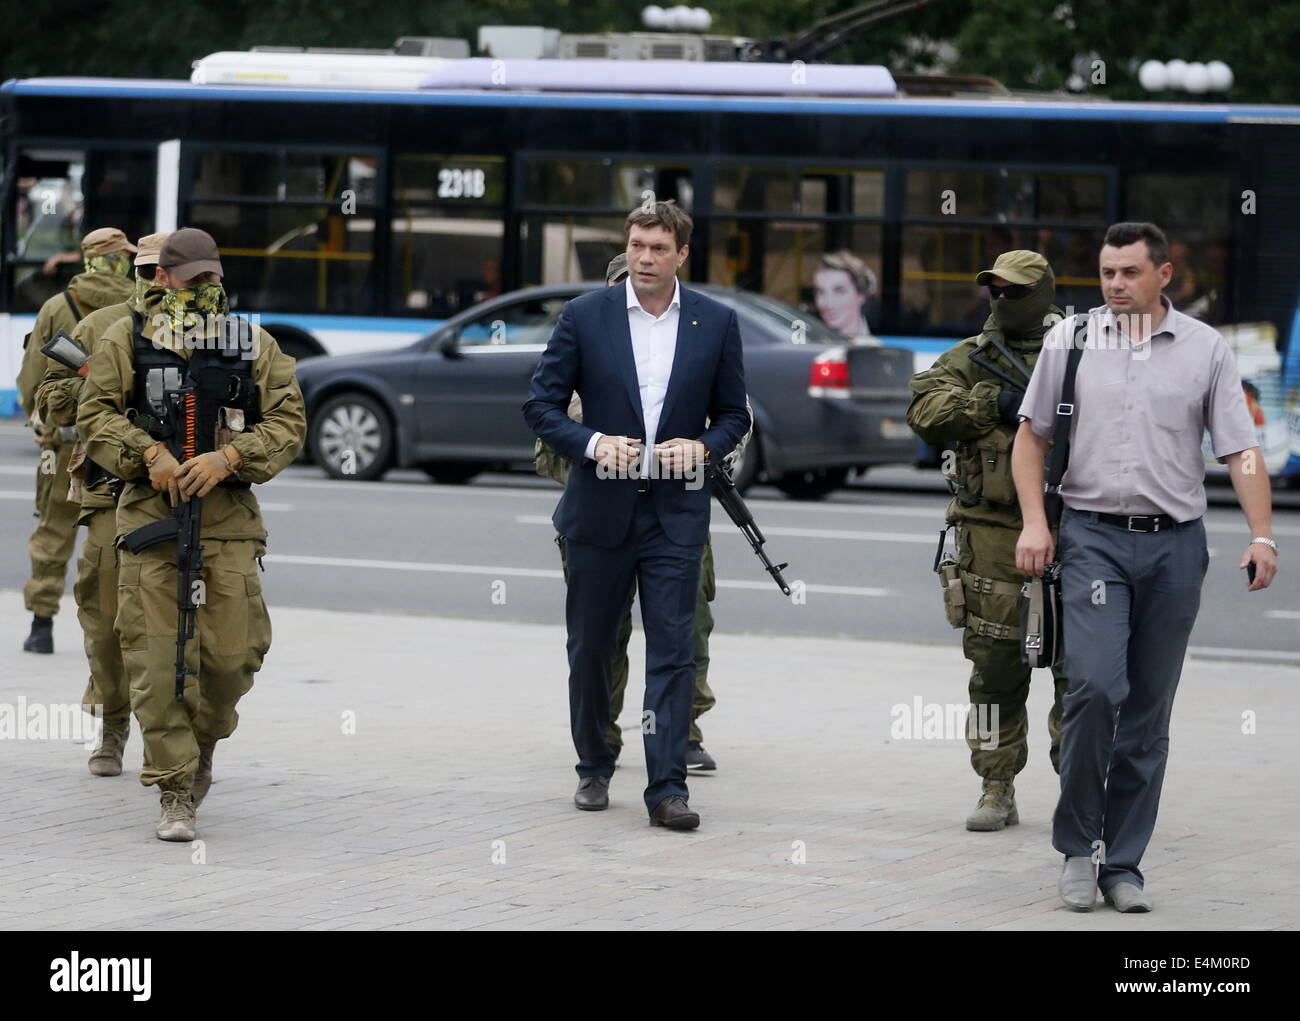 Donetsk, Ukraine. 13th July, 2014. Oleg Tsarev (C), chairman of the Parliament of the Union of Lugansk and Donetsk - Stock Image